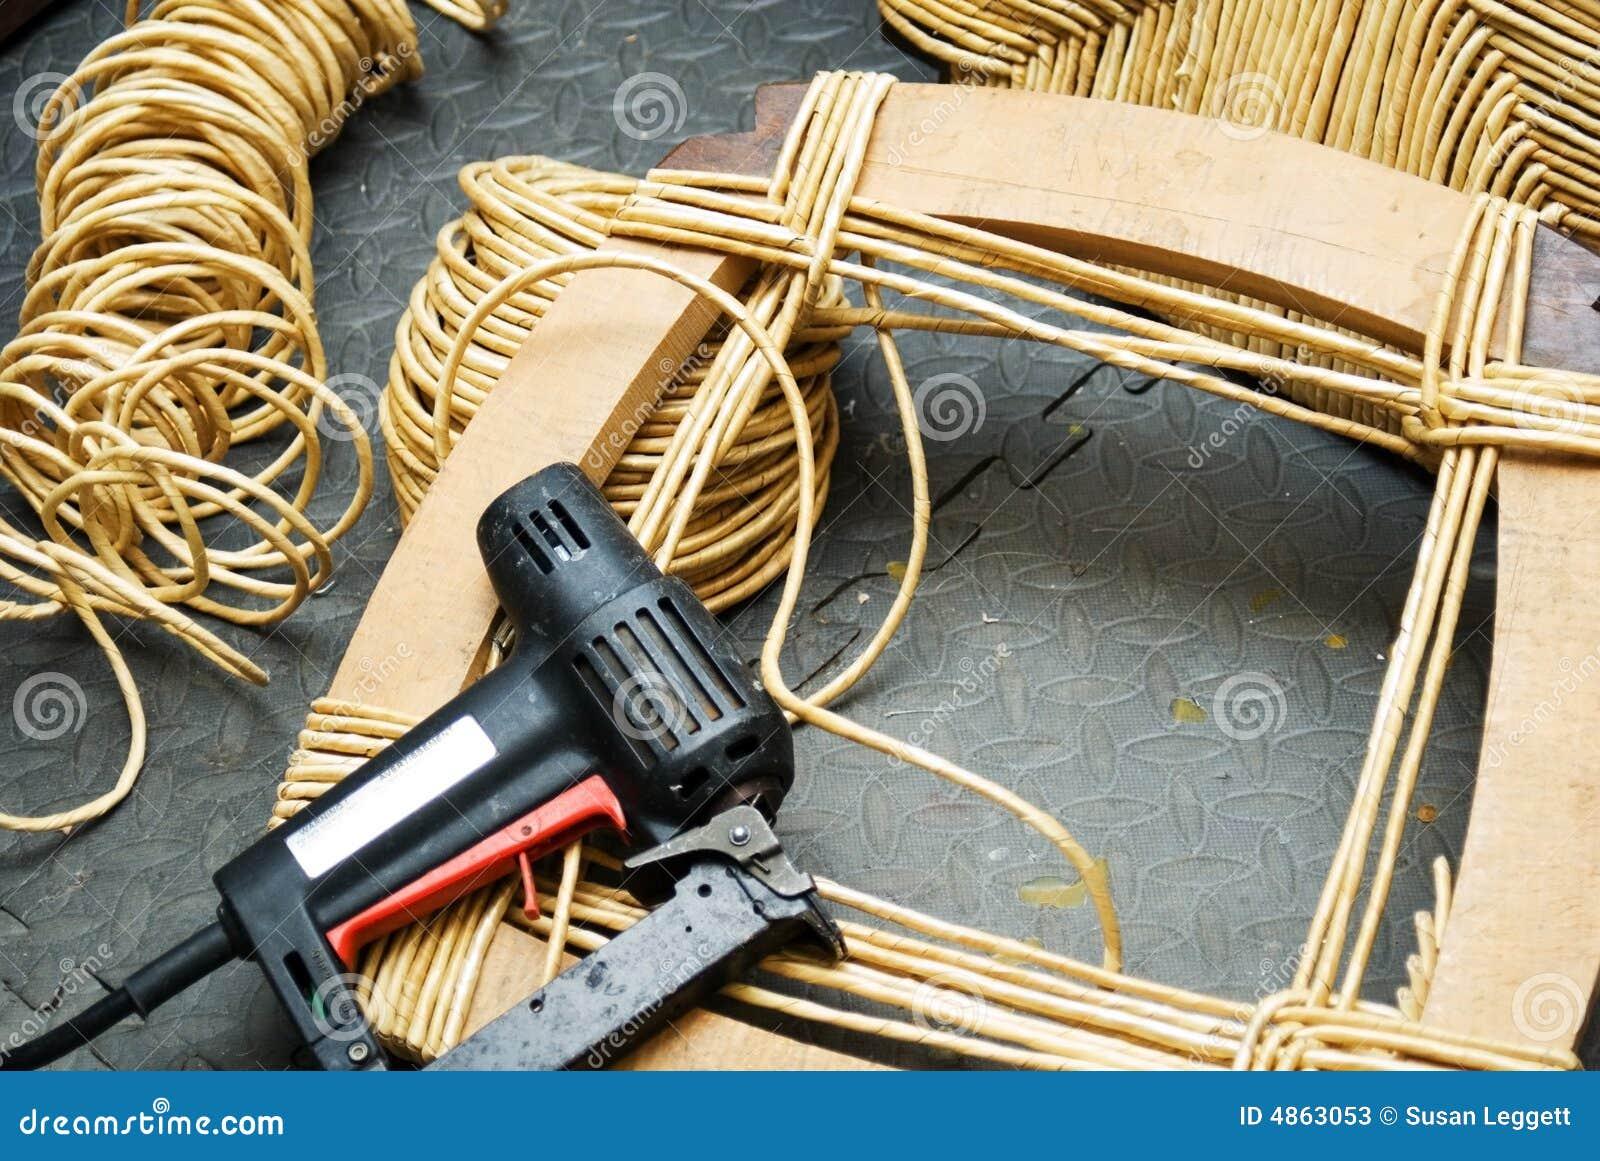 Furniture Repair/crafts